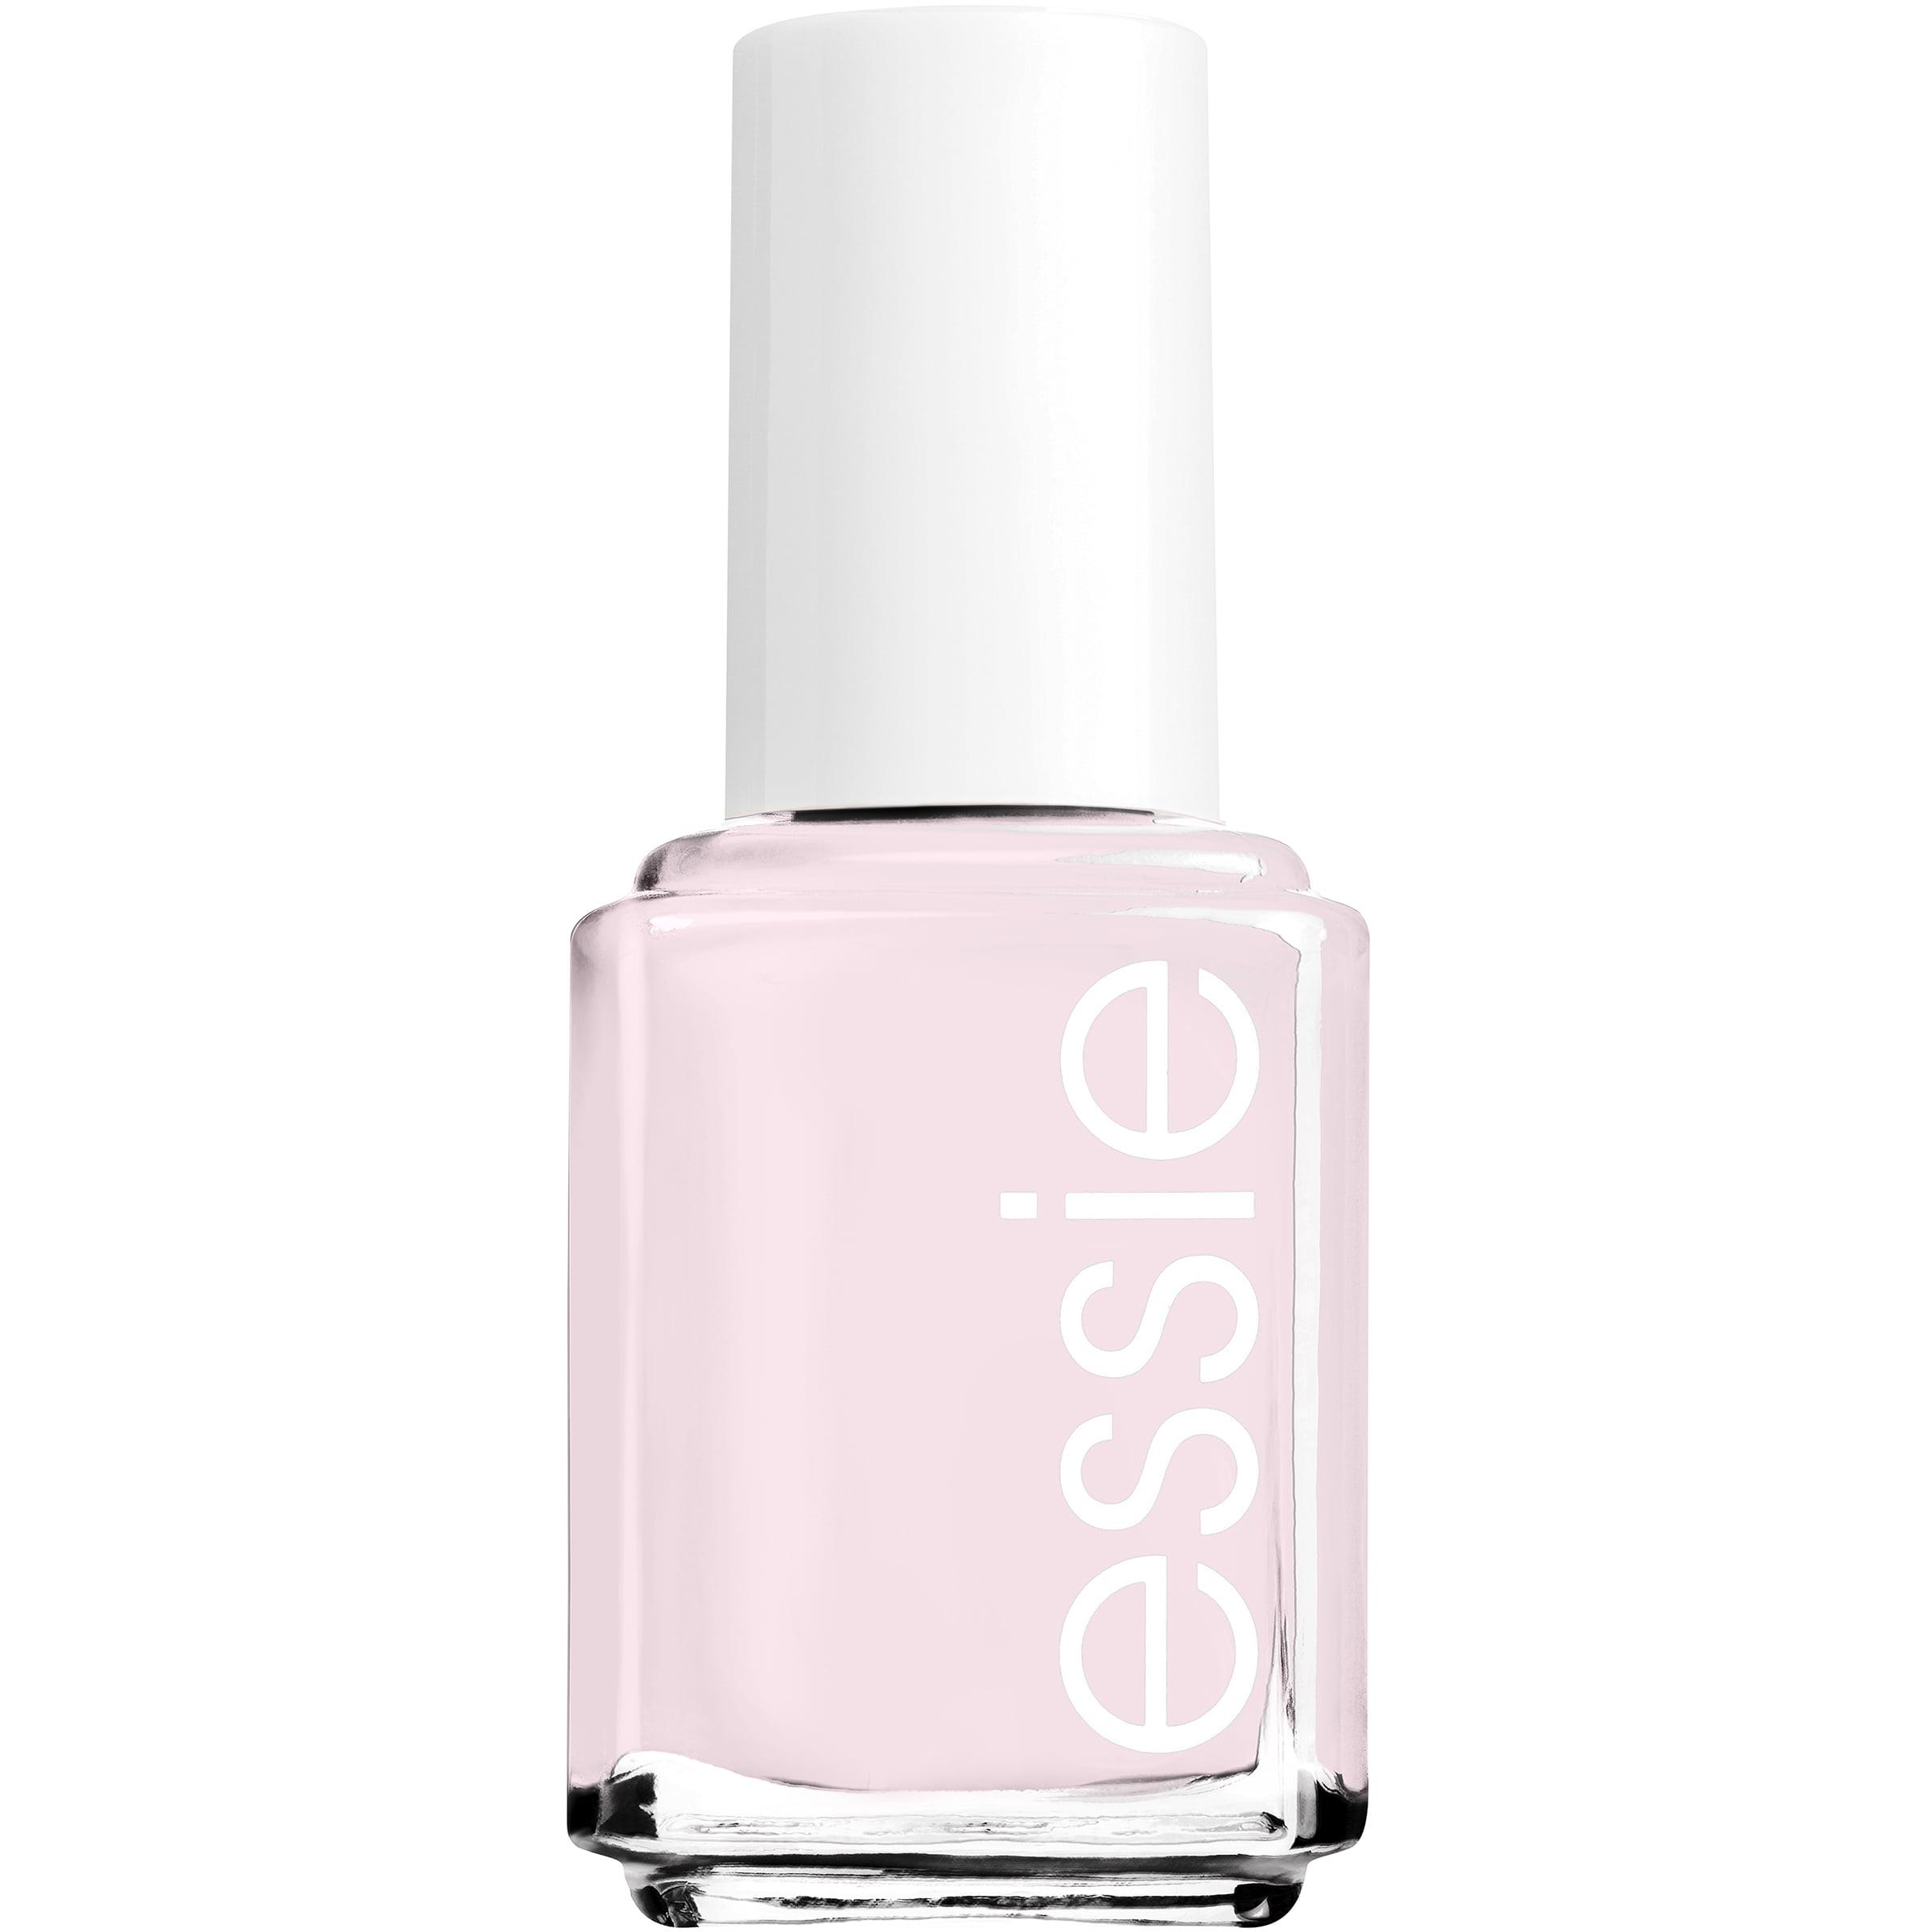 Essie Nail Polish (Sheers) Minimalistic, 0.46 fl oz - Walmart.com